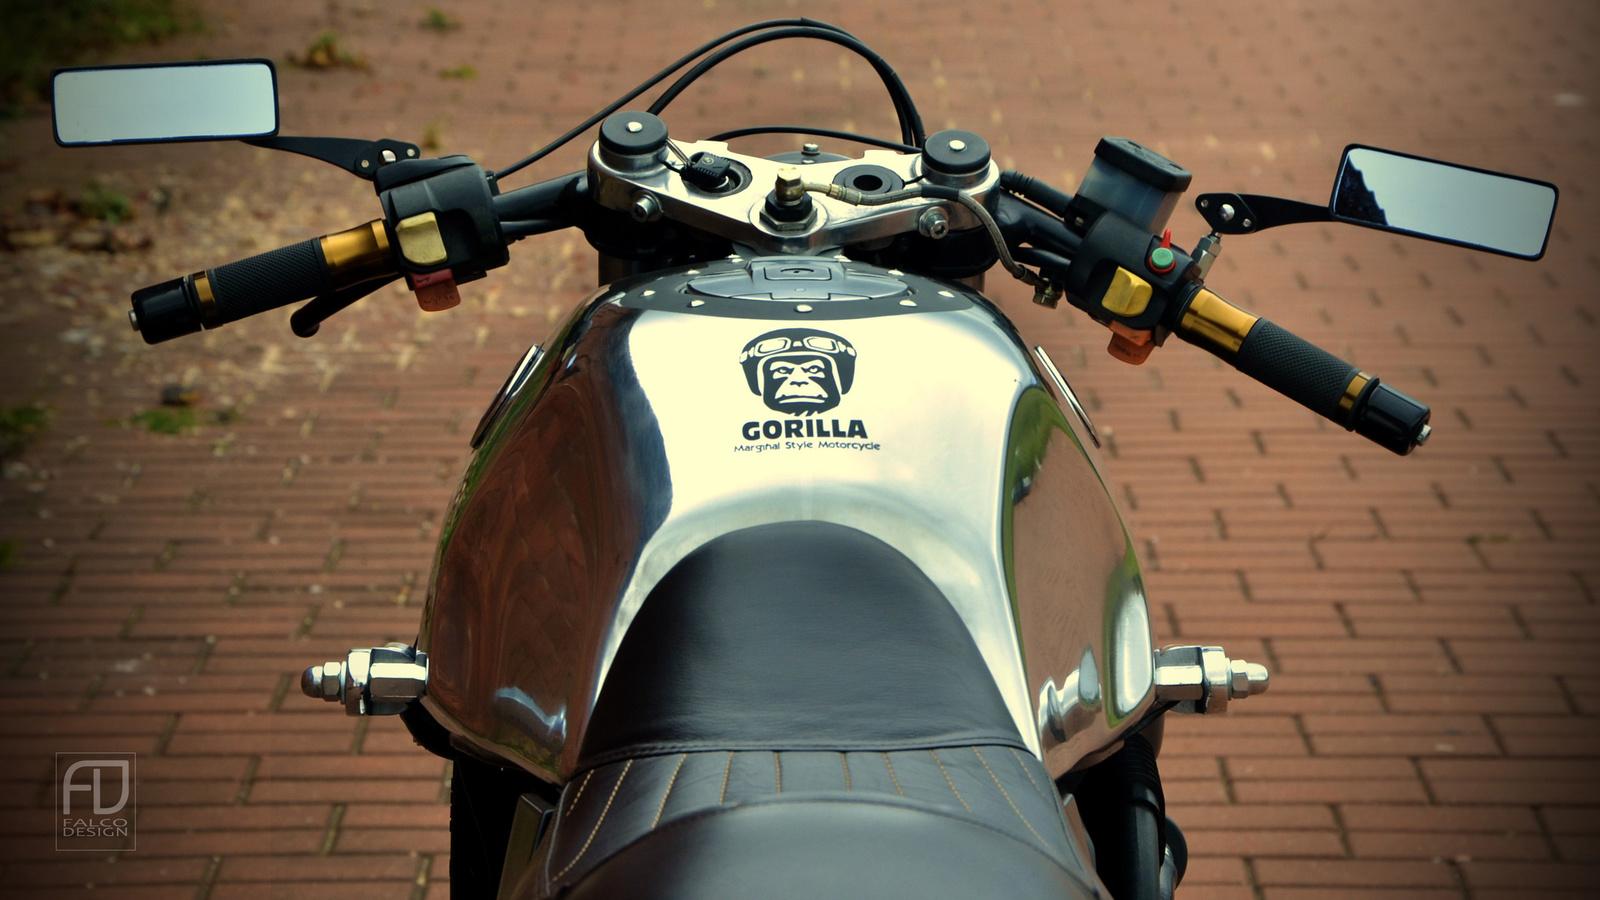 мотоцикл, байк, bmw ,k100 ,gorilla